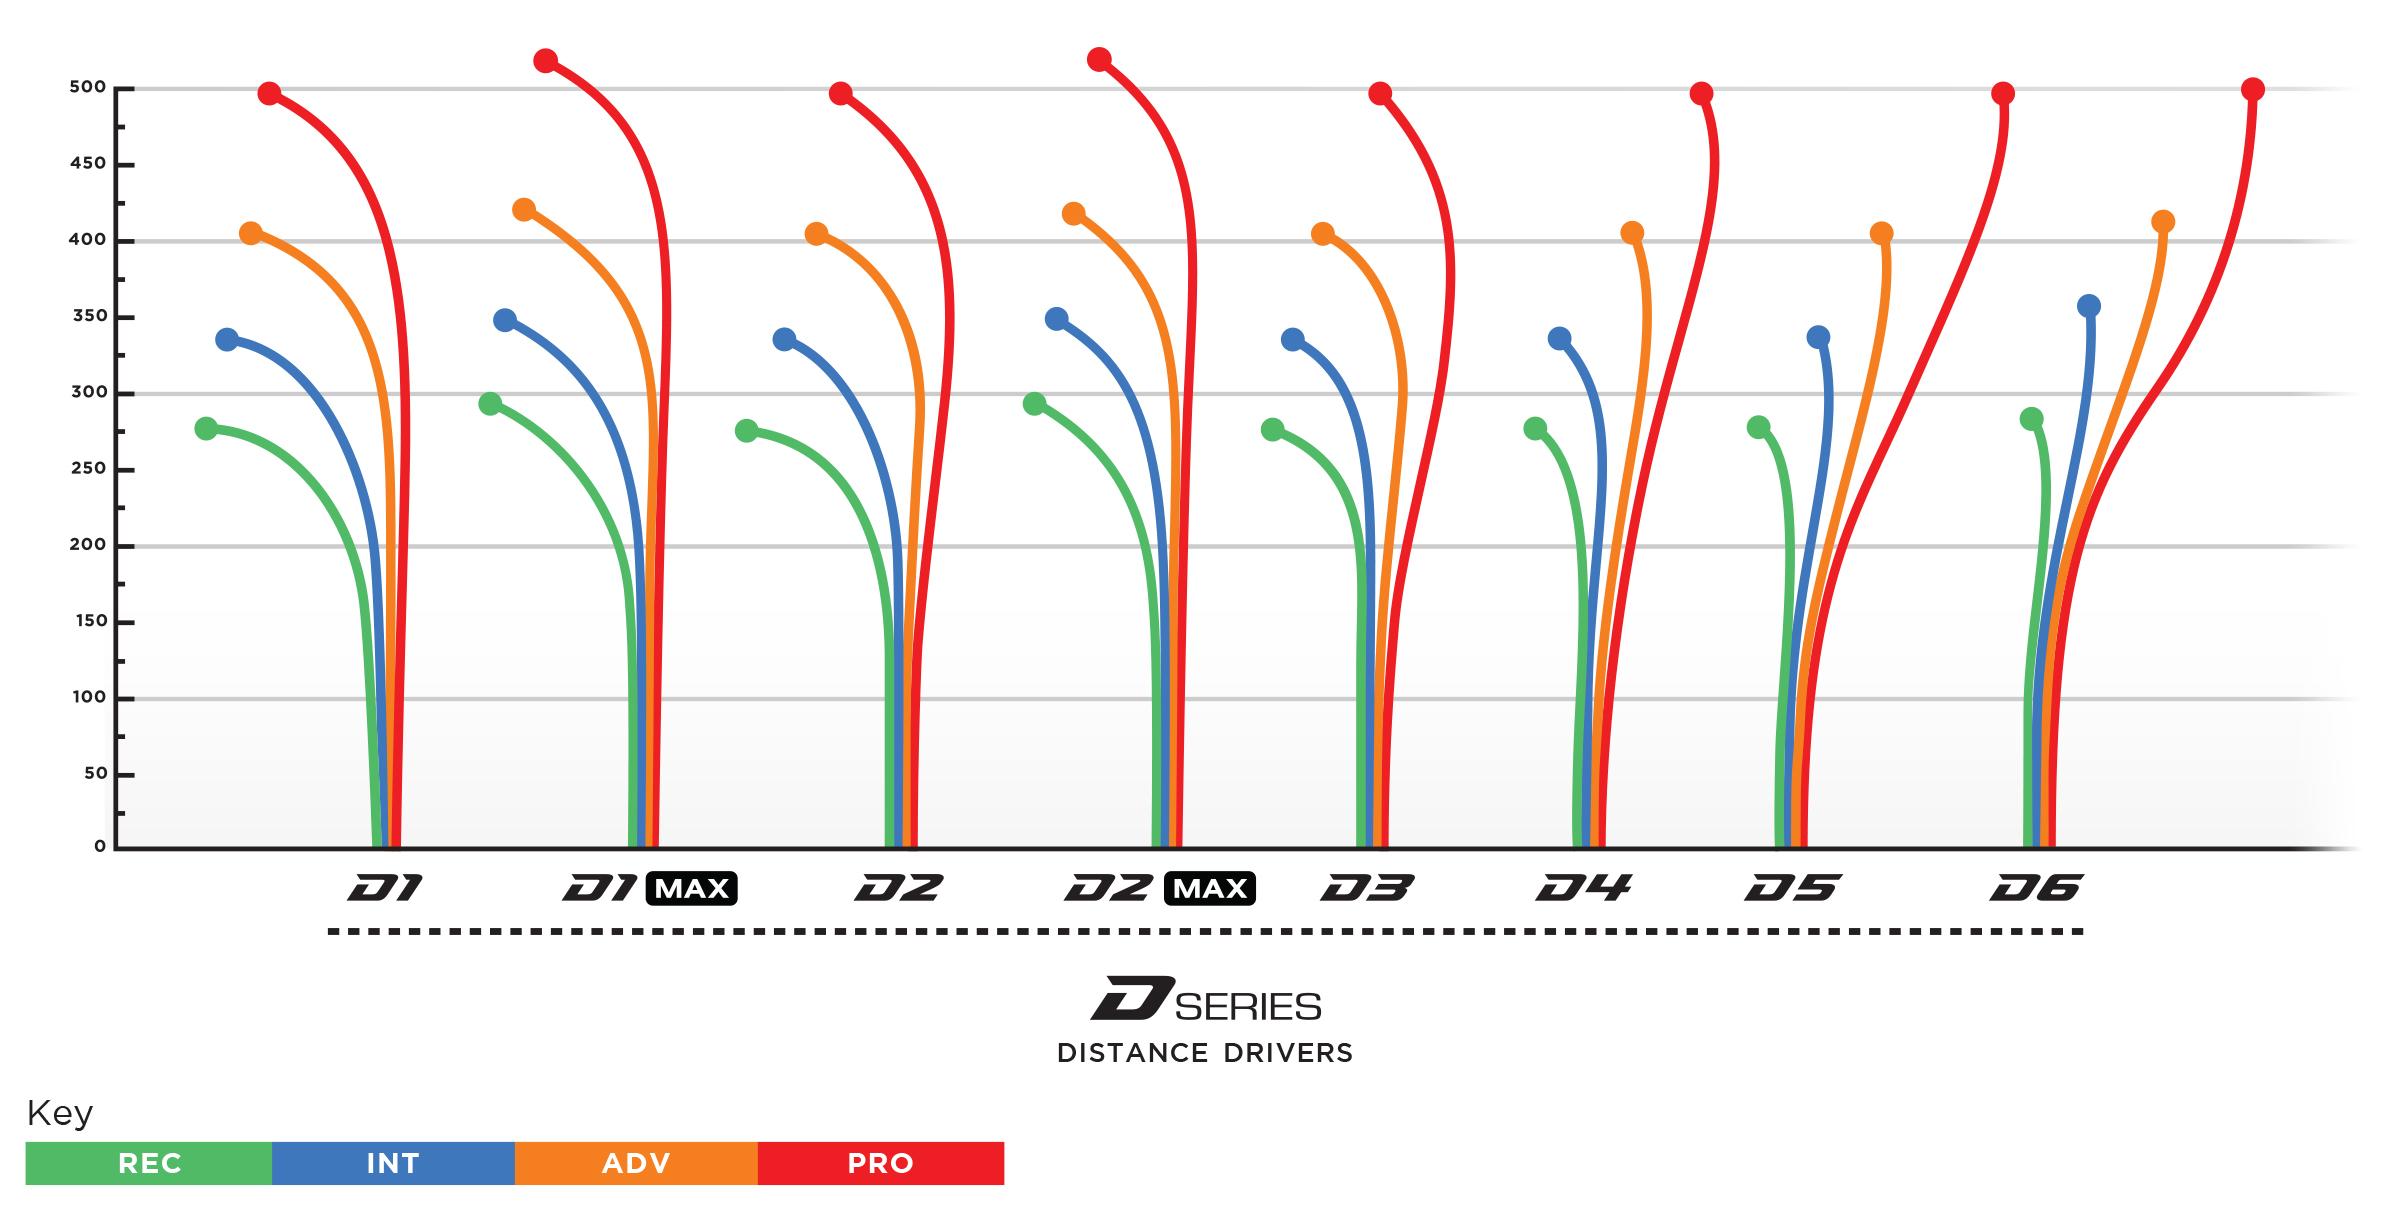 Distance Drivers: Prodigy 400G D3